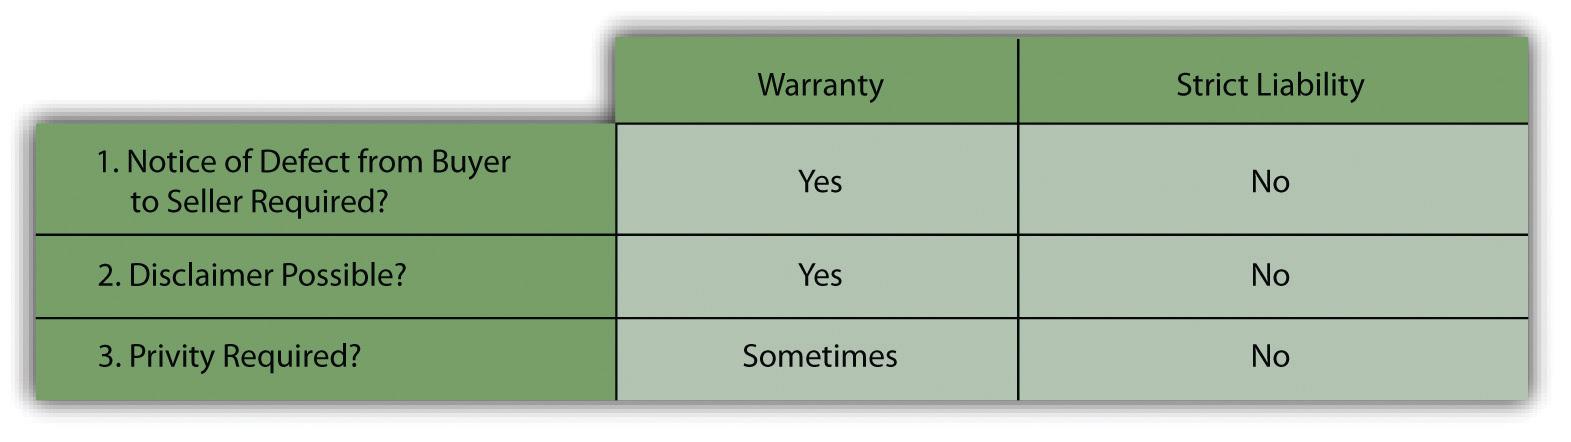 strict liability tort law pdf